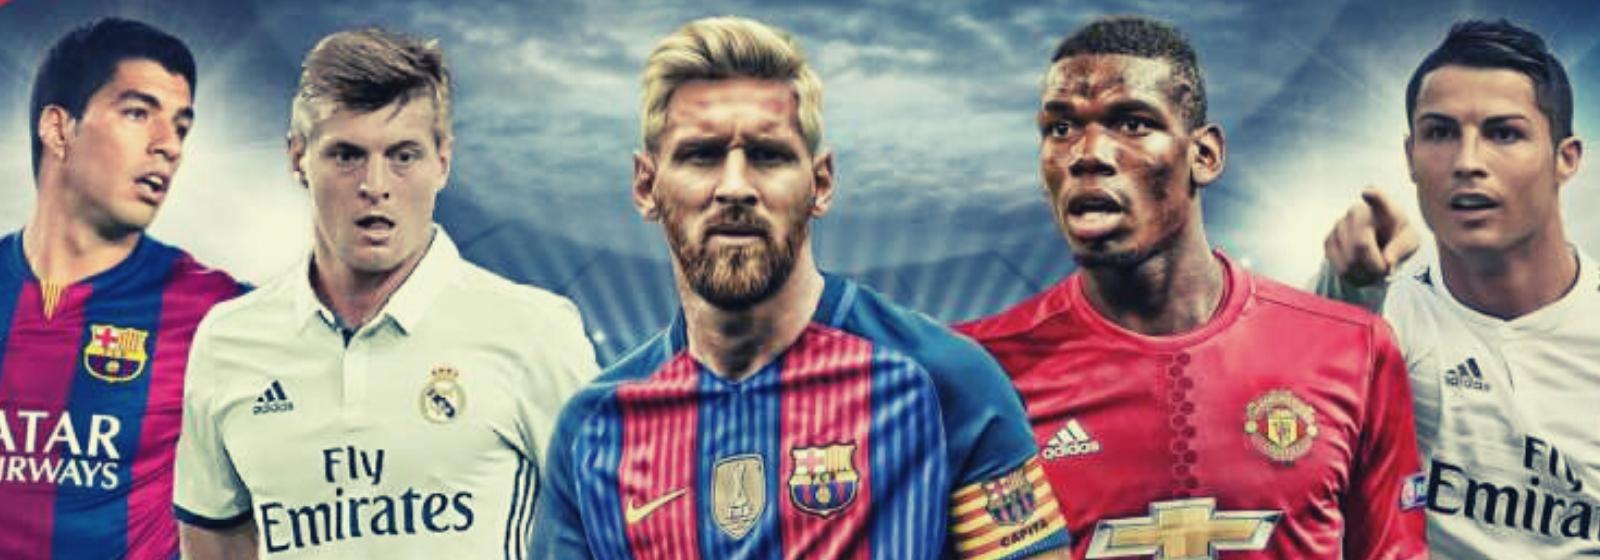 European Leagues' 2020-21 Seasons Start And Finish